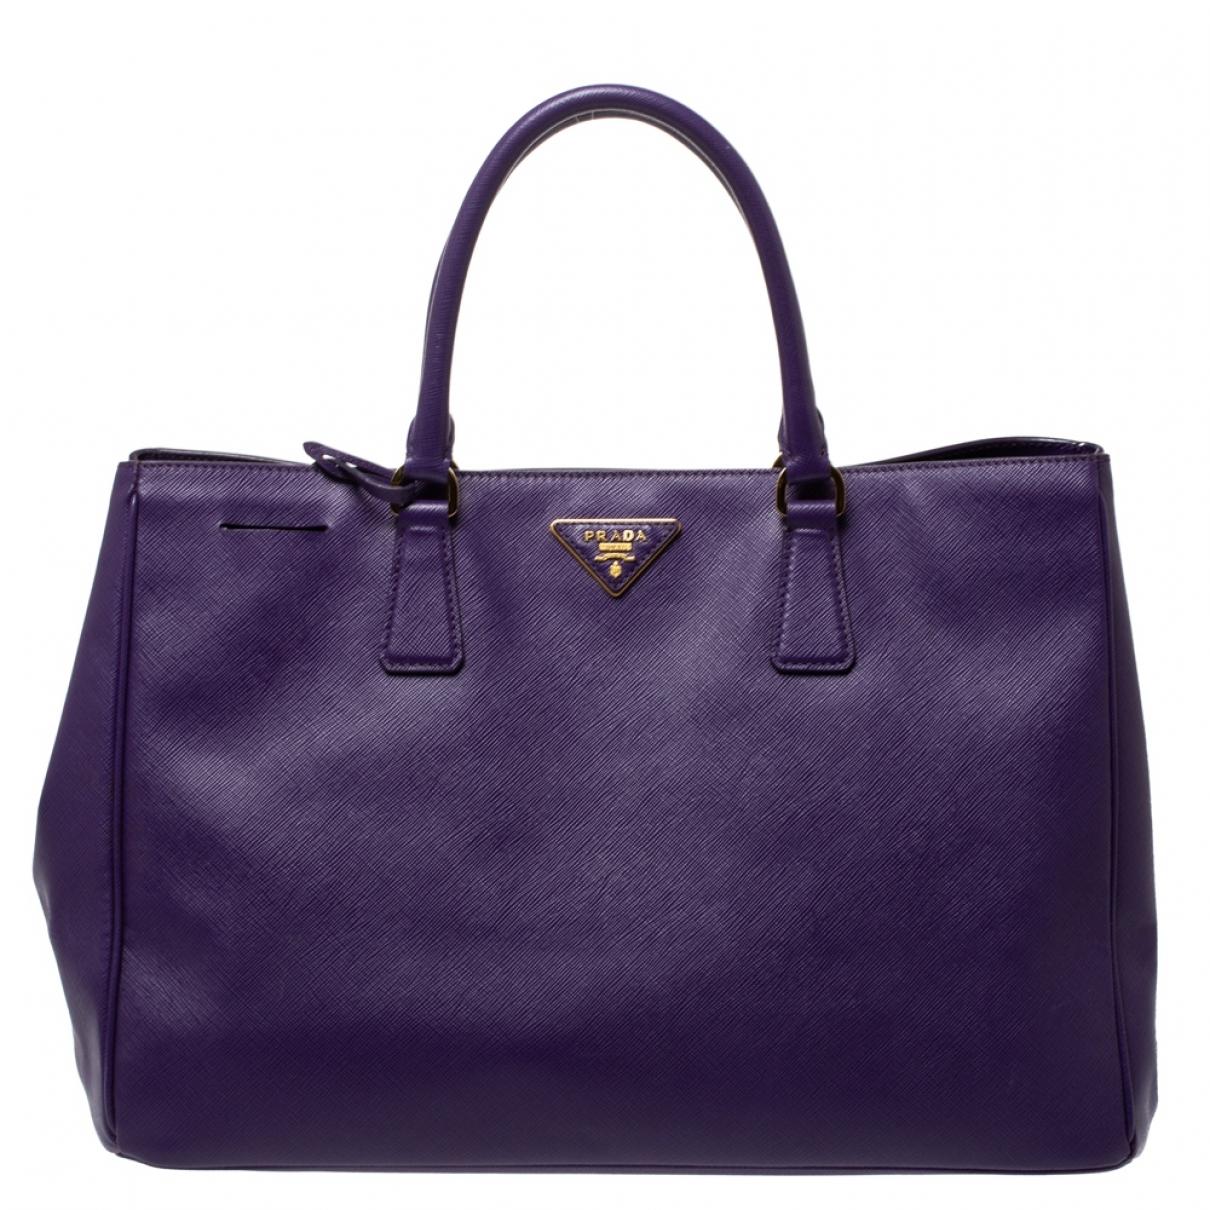 Prada saffiano  Purple Leather handbag for Women N